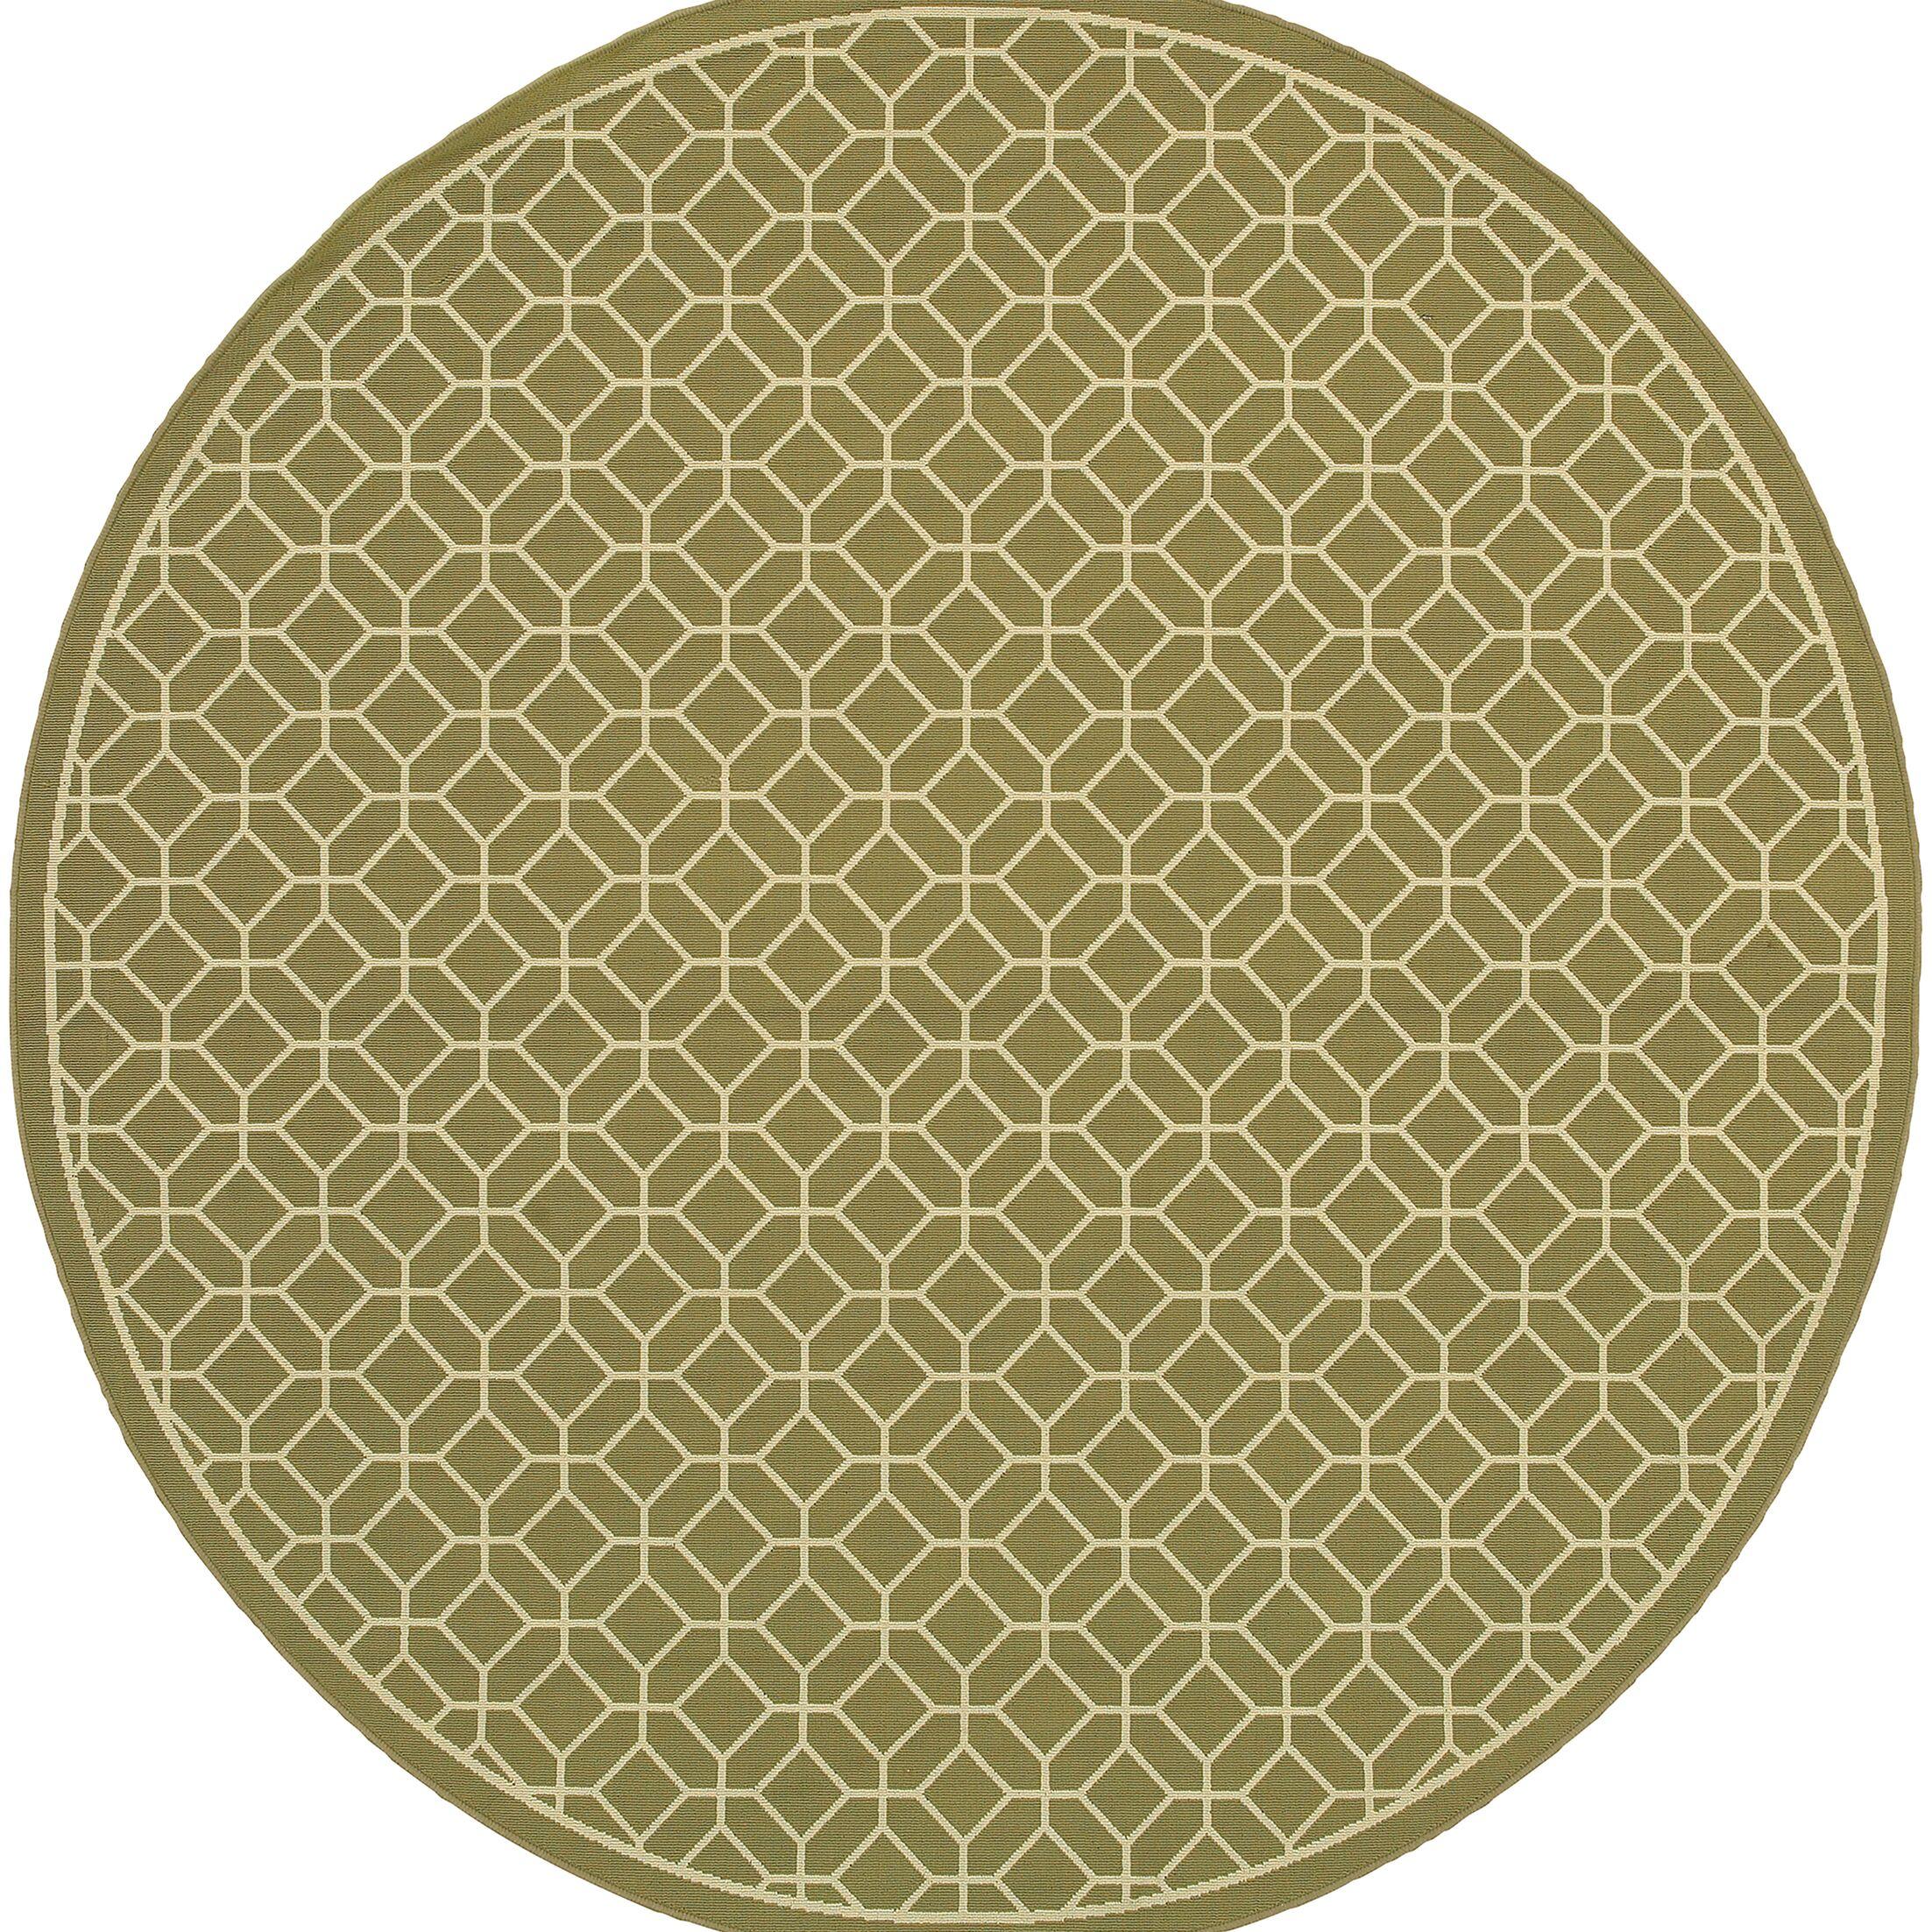 Liza Green/Ivory Indoor/Outdoor Area Rug Rug Size: Round 7'10